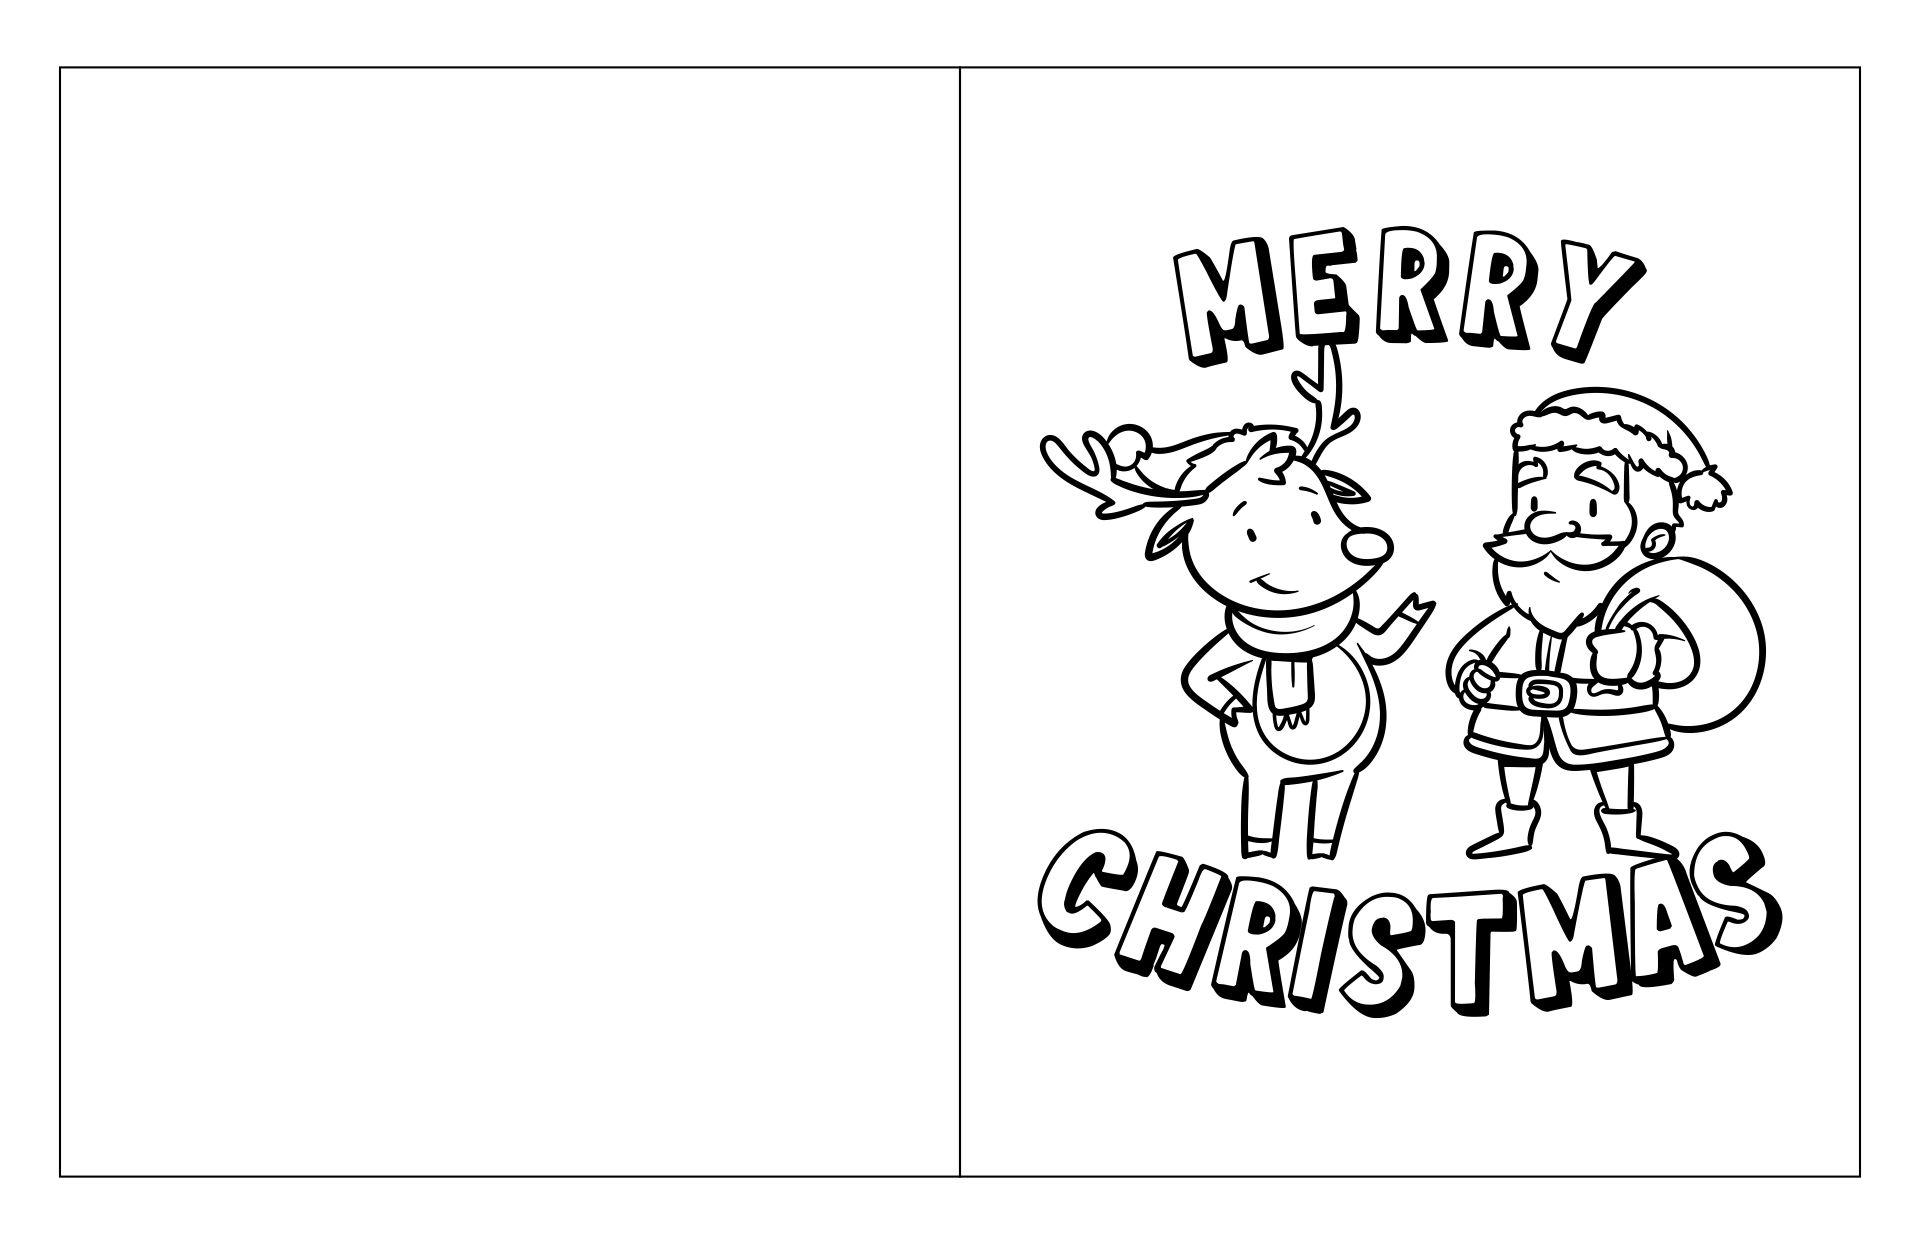 Printable Christmas Cards You Can Color